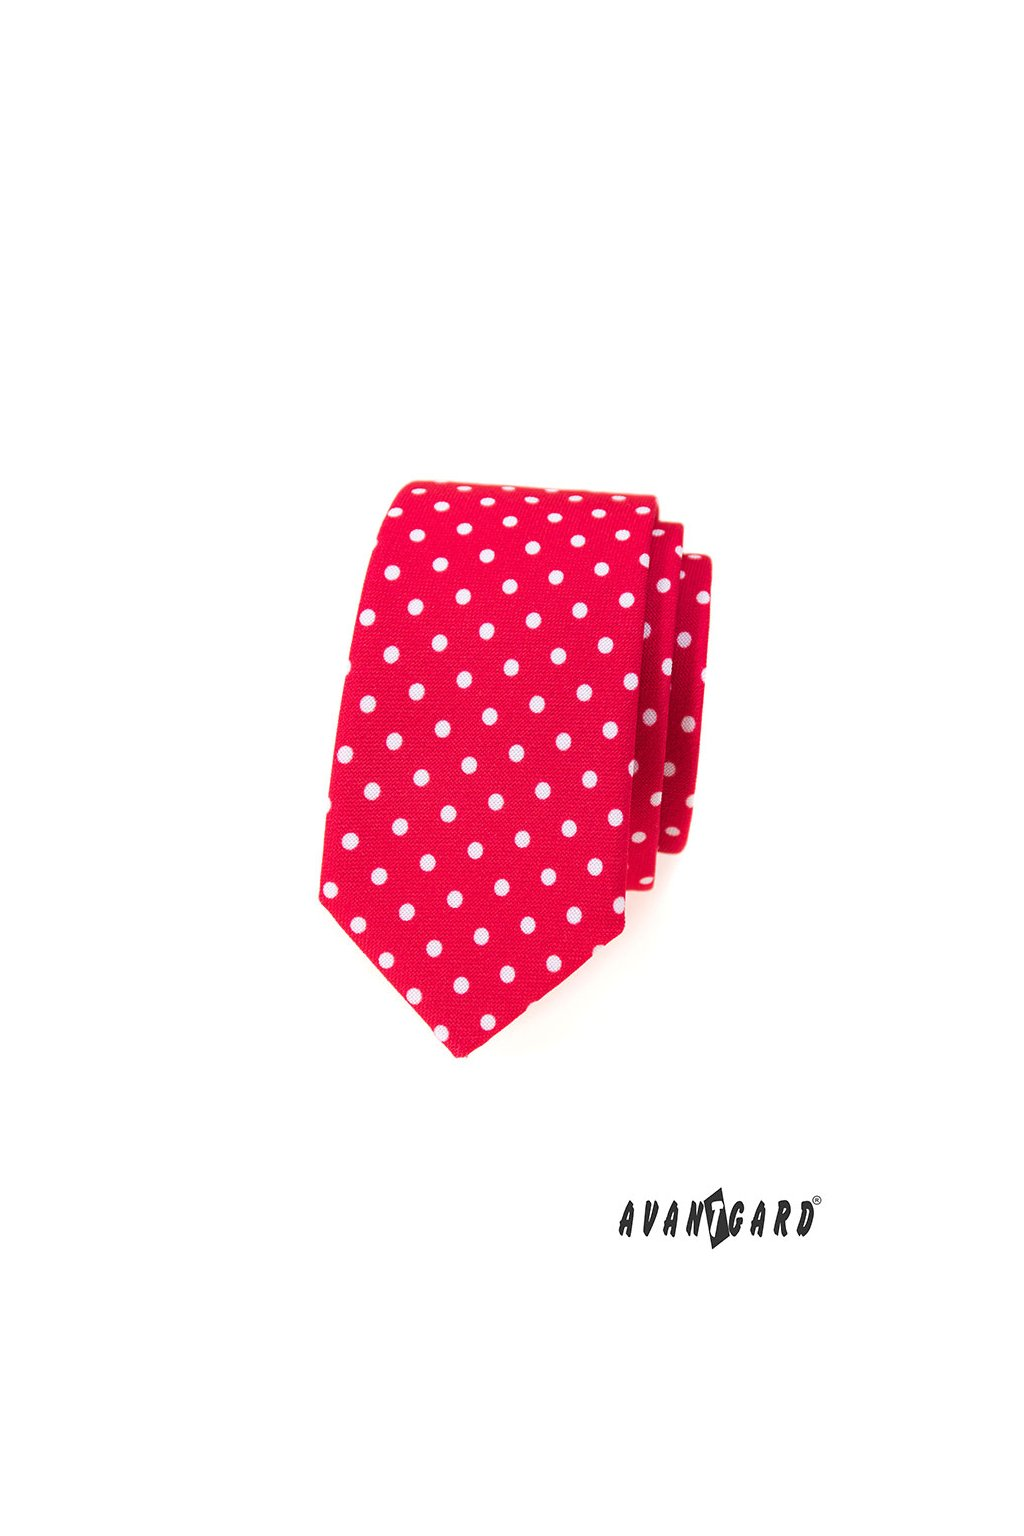 Kravata SLIM LUX červená s bílými puntíky 571 - 1979